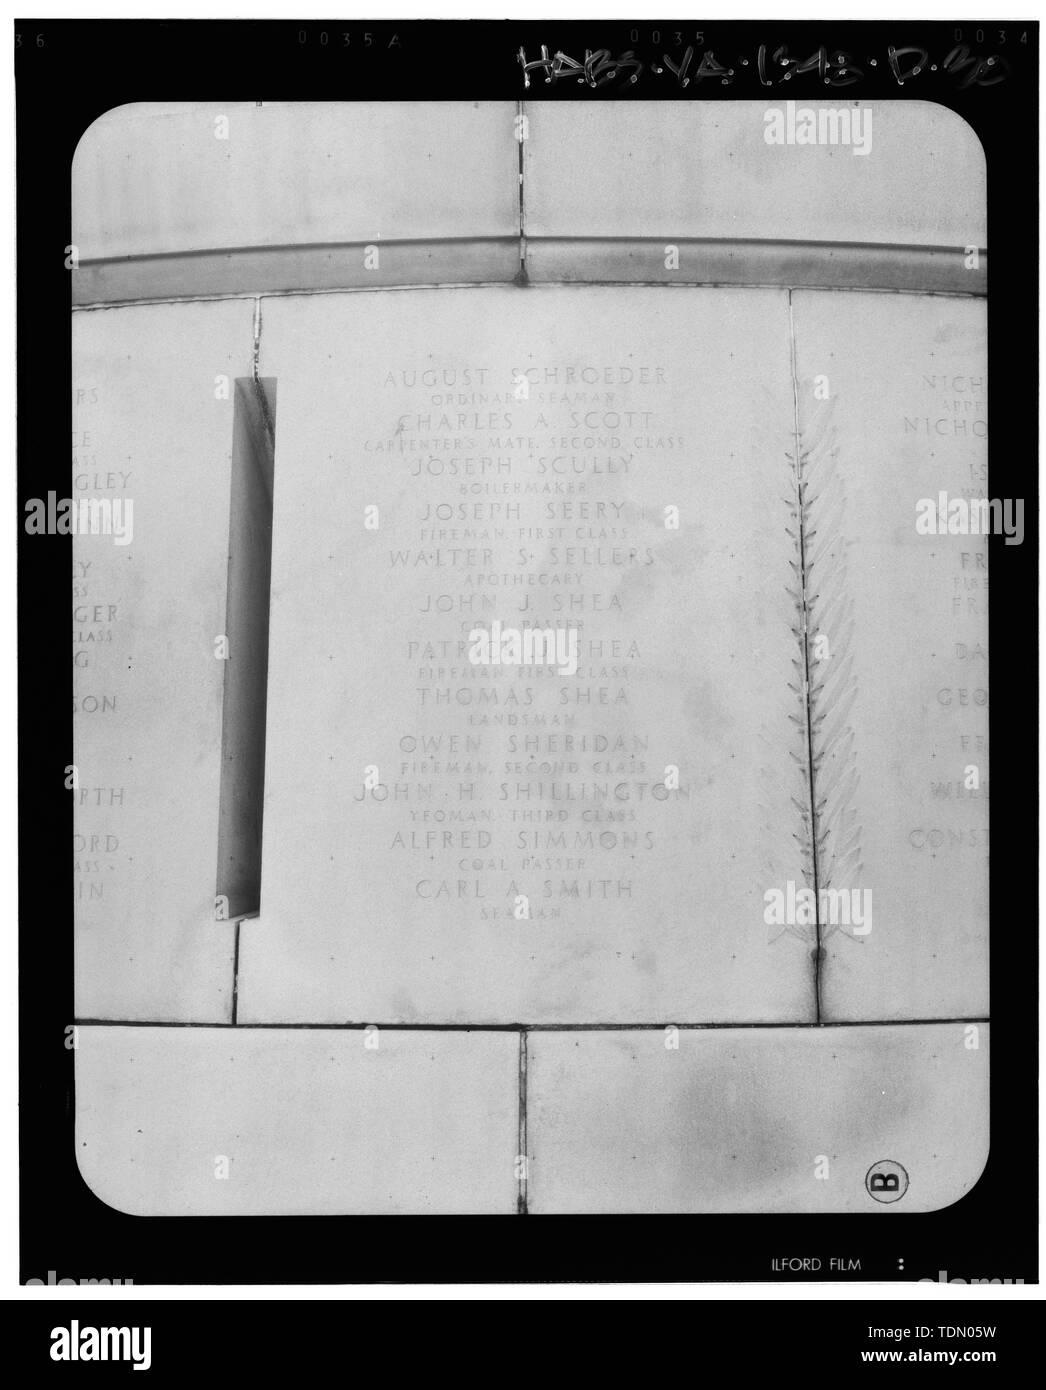 Panel 20 - Arlington National Cemetery, USS Maine Memorial, Arlington, Arlington County, VA; U.S. Army Corps of Engineers; Wyeth, Nathan C; Black, William M; Patrick, Mason M; Ferguson, H B; Bixby, W H; Goodson, W F; Lackawanna Steel Company; T.L. Huston Construction Company; Harris Brothers; Clark, D Lombillo; Primelles, Arturo; Rhodes, D H; Jenkins, Oliver B; Tilford, James D; Aleshire, J B; Stimson, H E; Scofield, John J; Hugh, R P; Houston, J B; Sharpe, Henry G; Downey, G F; Clem, L; Cosby, Spencer; Taft, William Howard; Commission of Fine Arts; Olmsted, Fredrick Law; French, Daniel Cheste - Stock Image